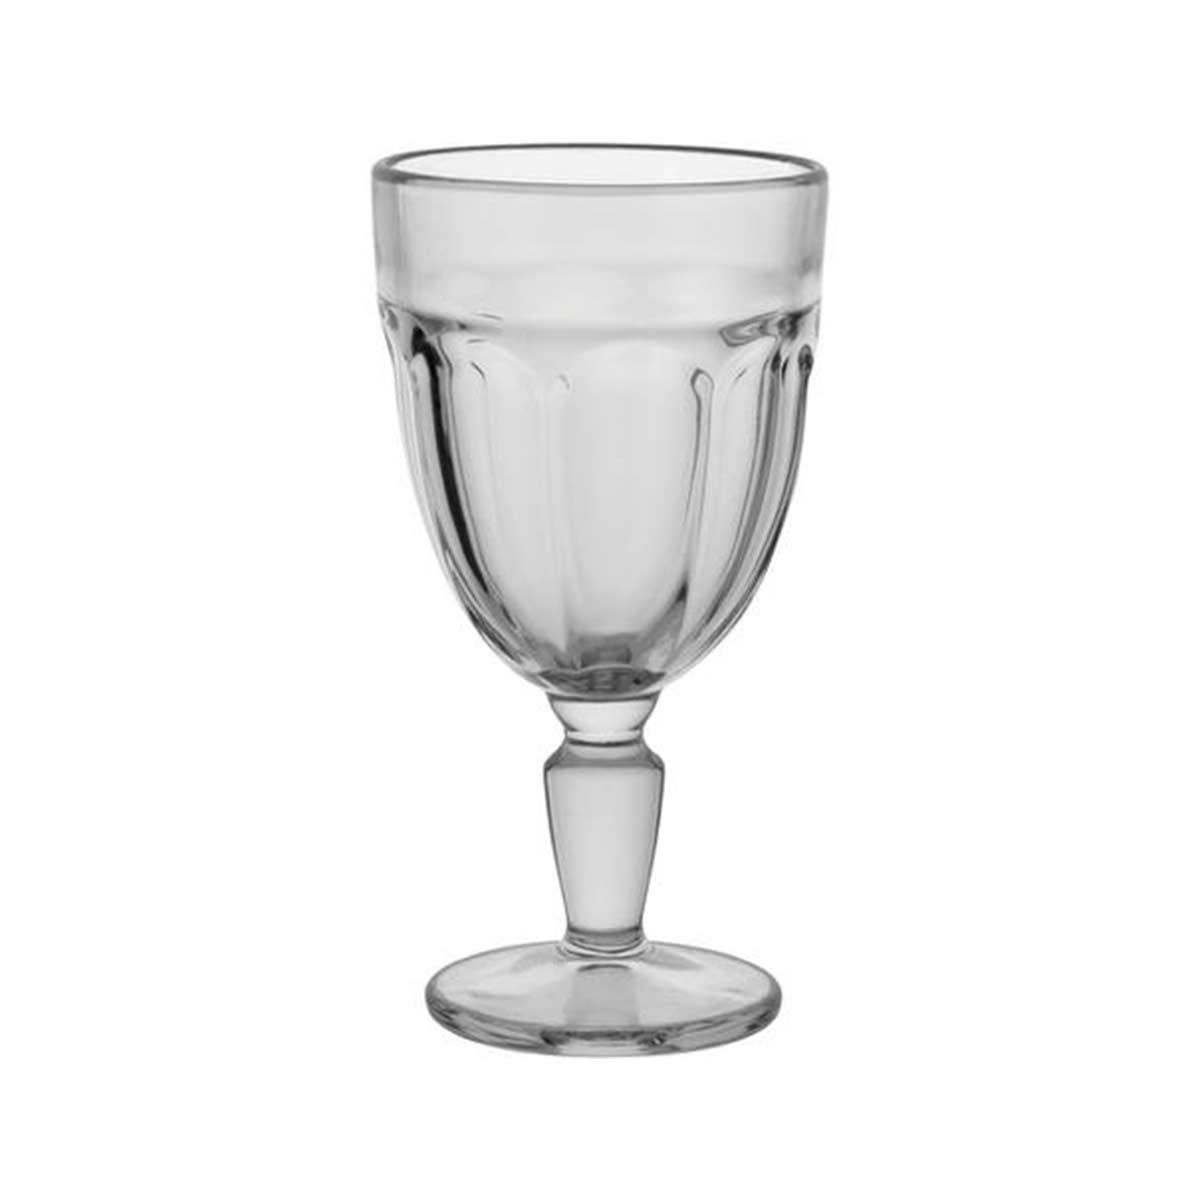 Jogo 6 Taças de Vidro Transparente Gavin 310 ml  - Lemis